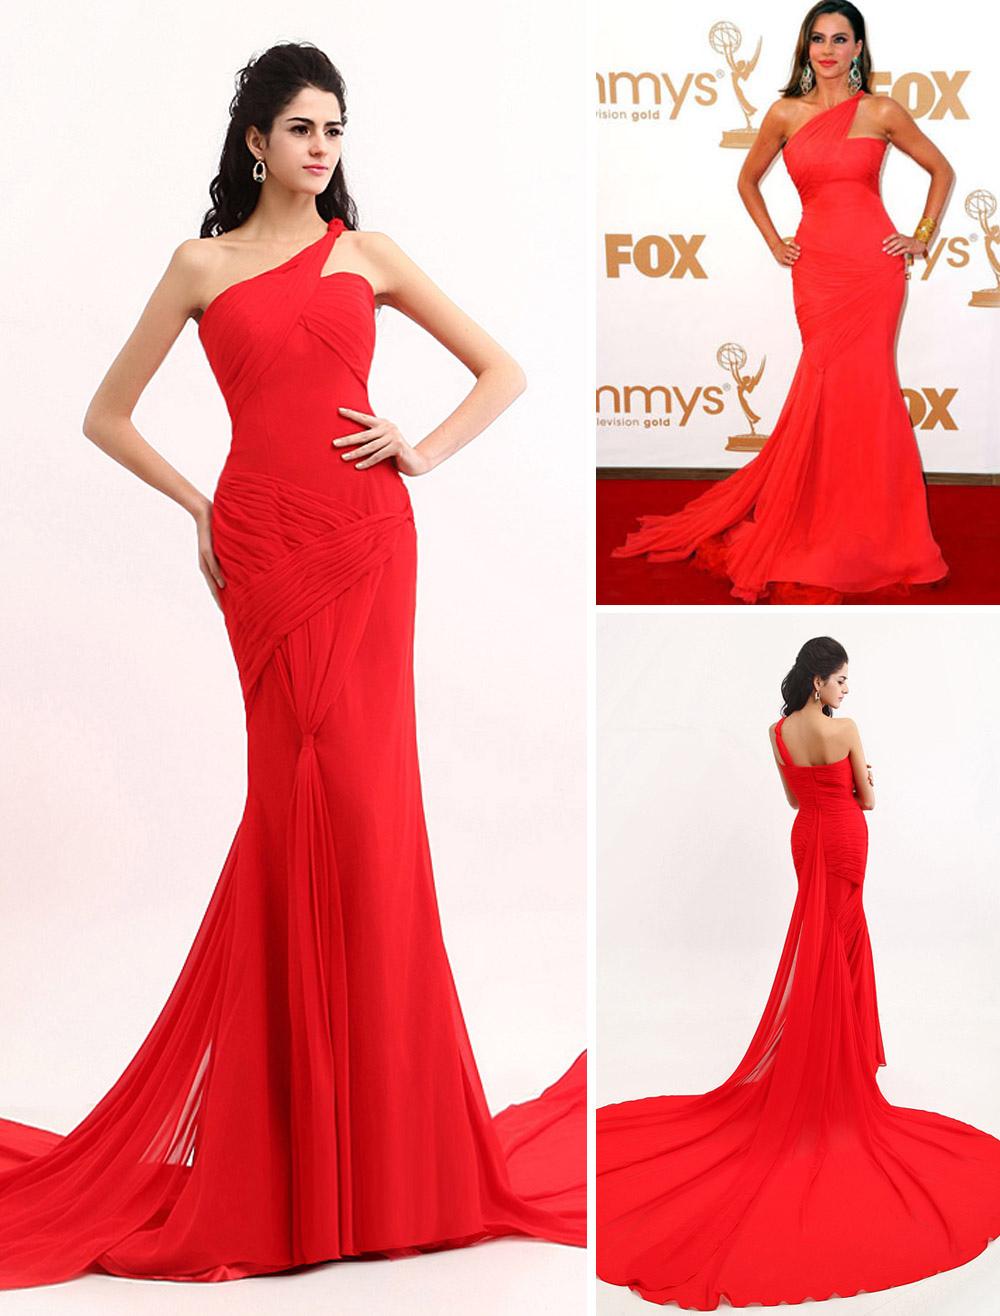 Red Sofia Vergara One-Shoulder Mermaid Trumpet Chiffon Emmy Awards Dress